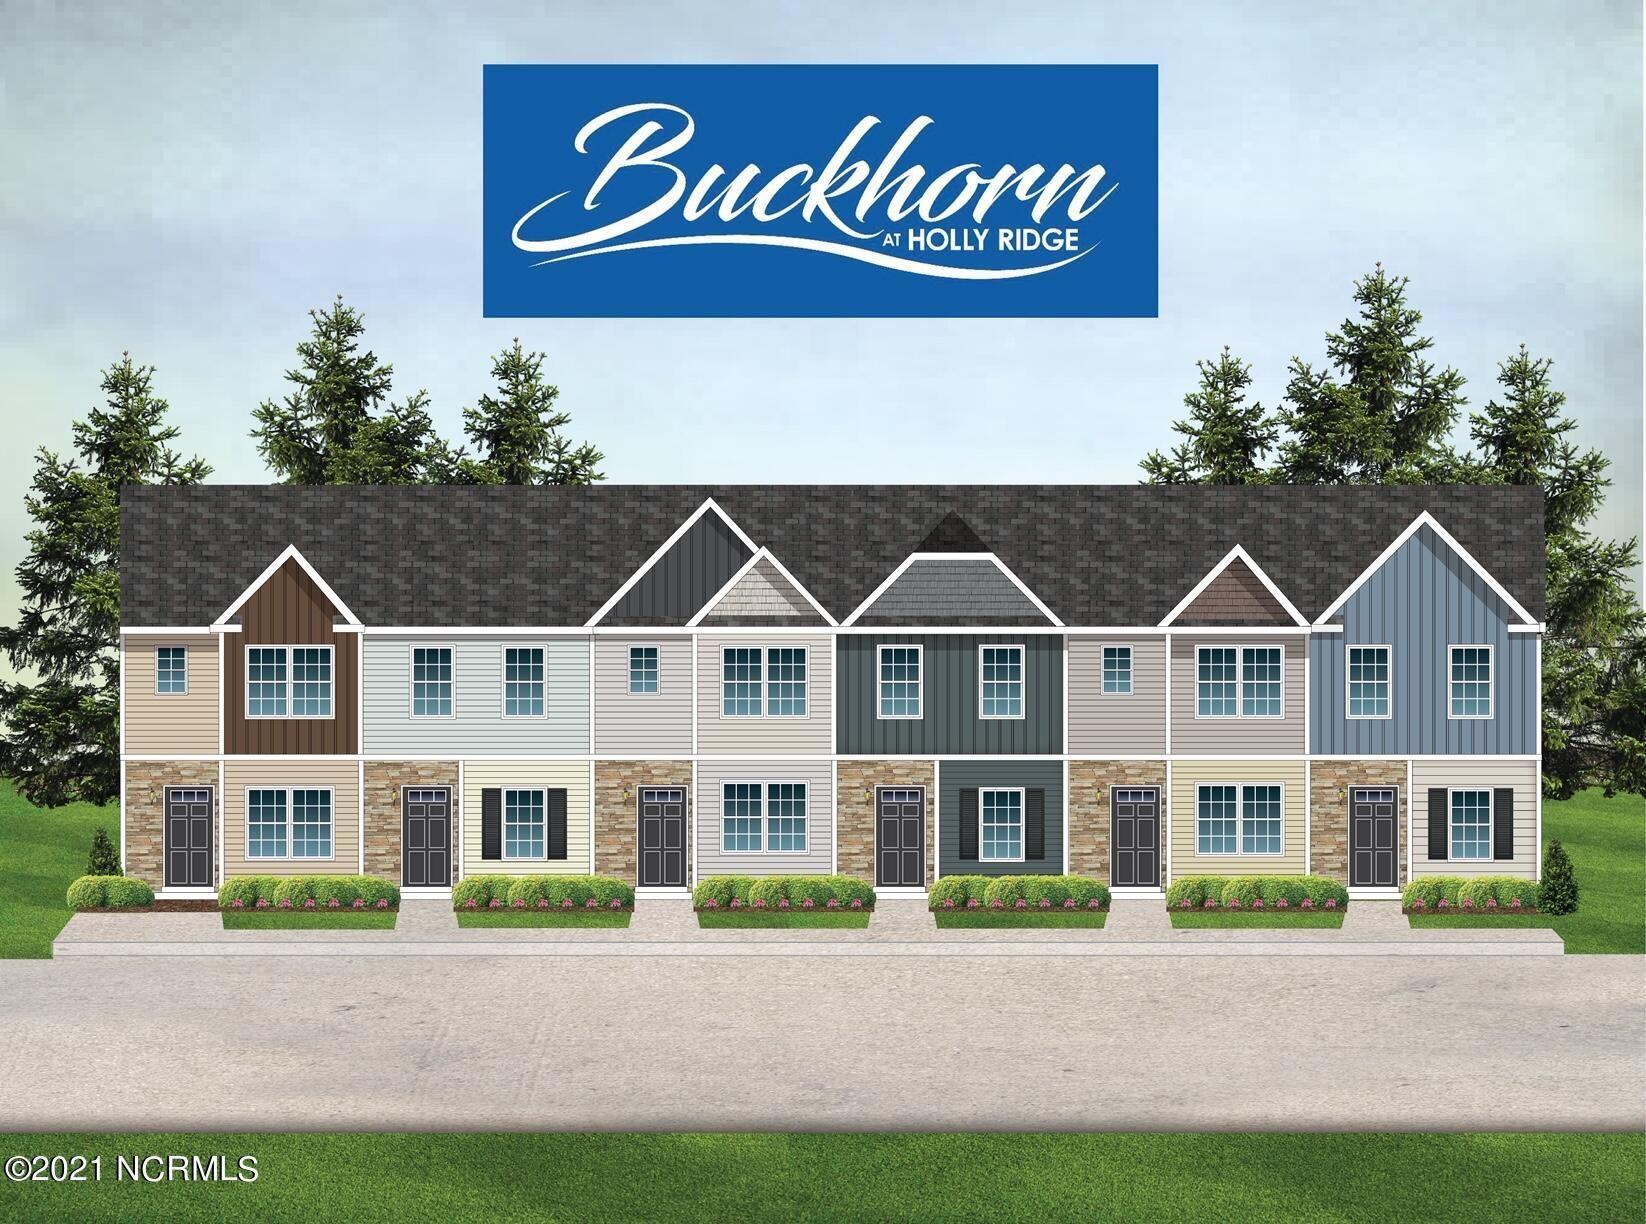 Photo of 175 Buckhorn Ave, Holly Ridge, NC 28445 (MLS # 100294378)